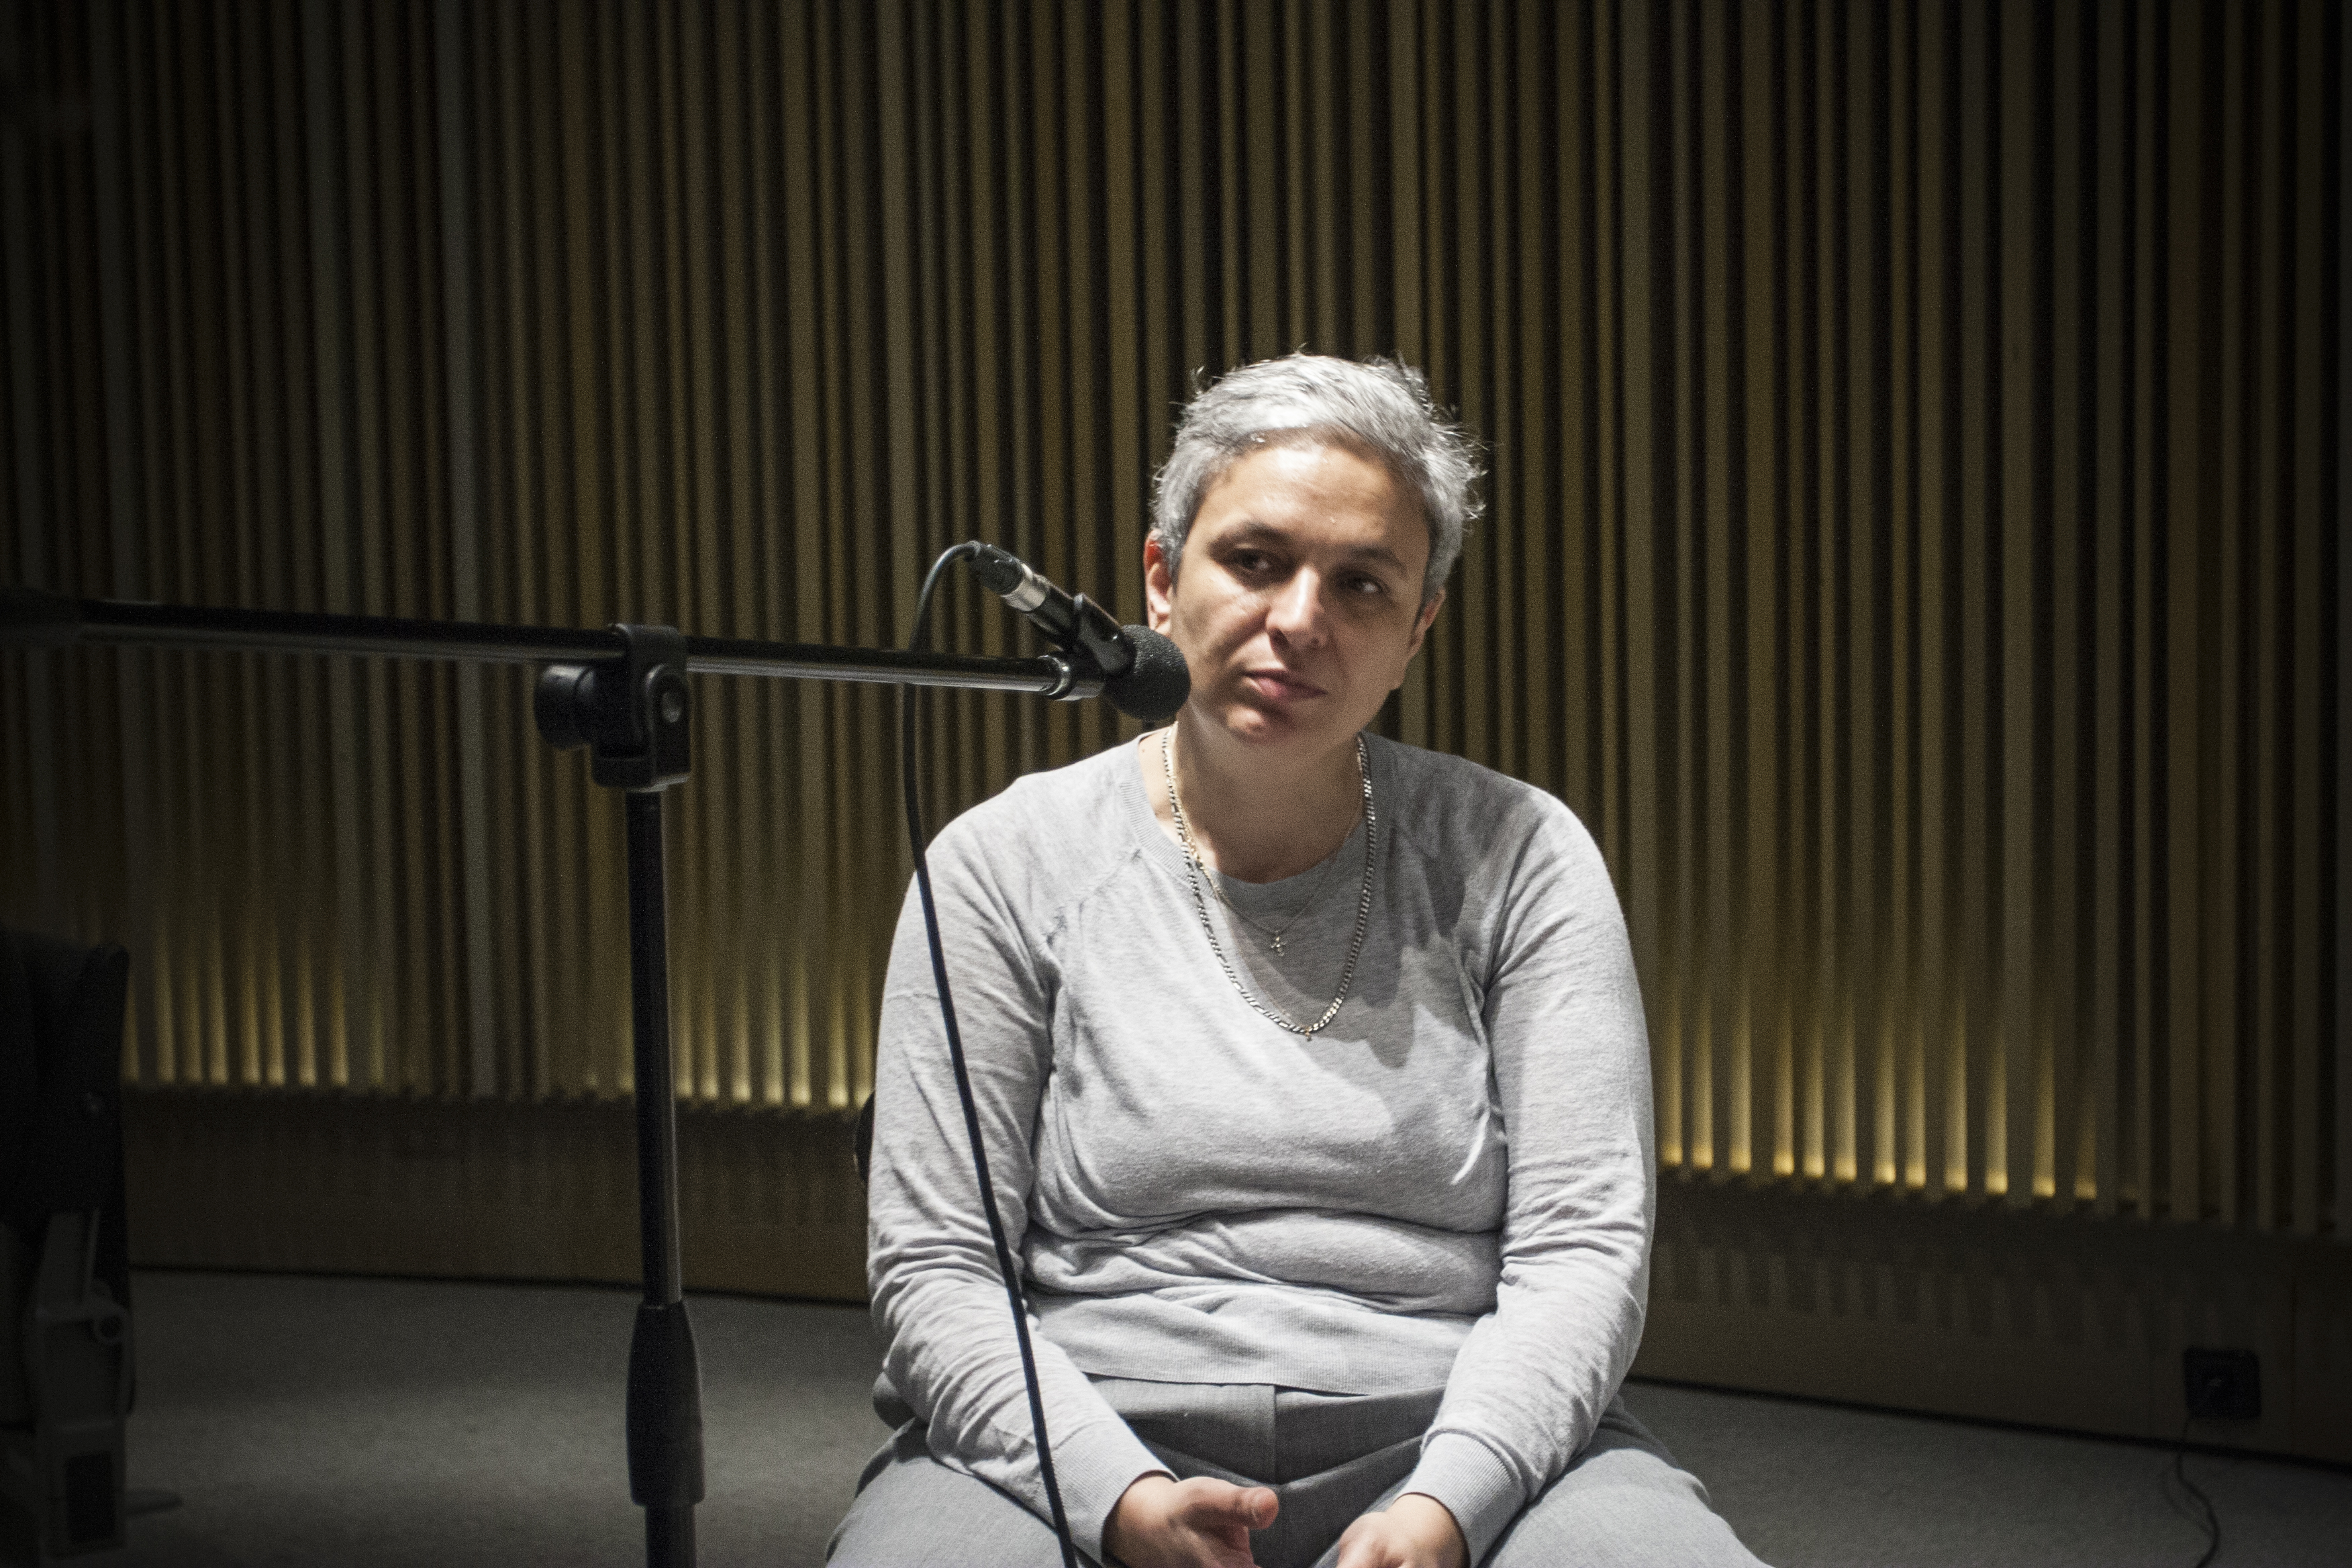 Image of Dora Garcia from Wikidata